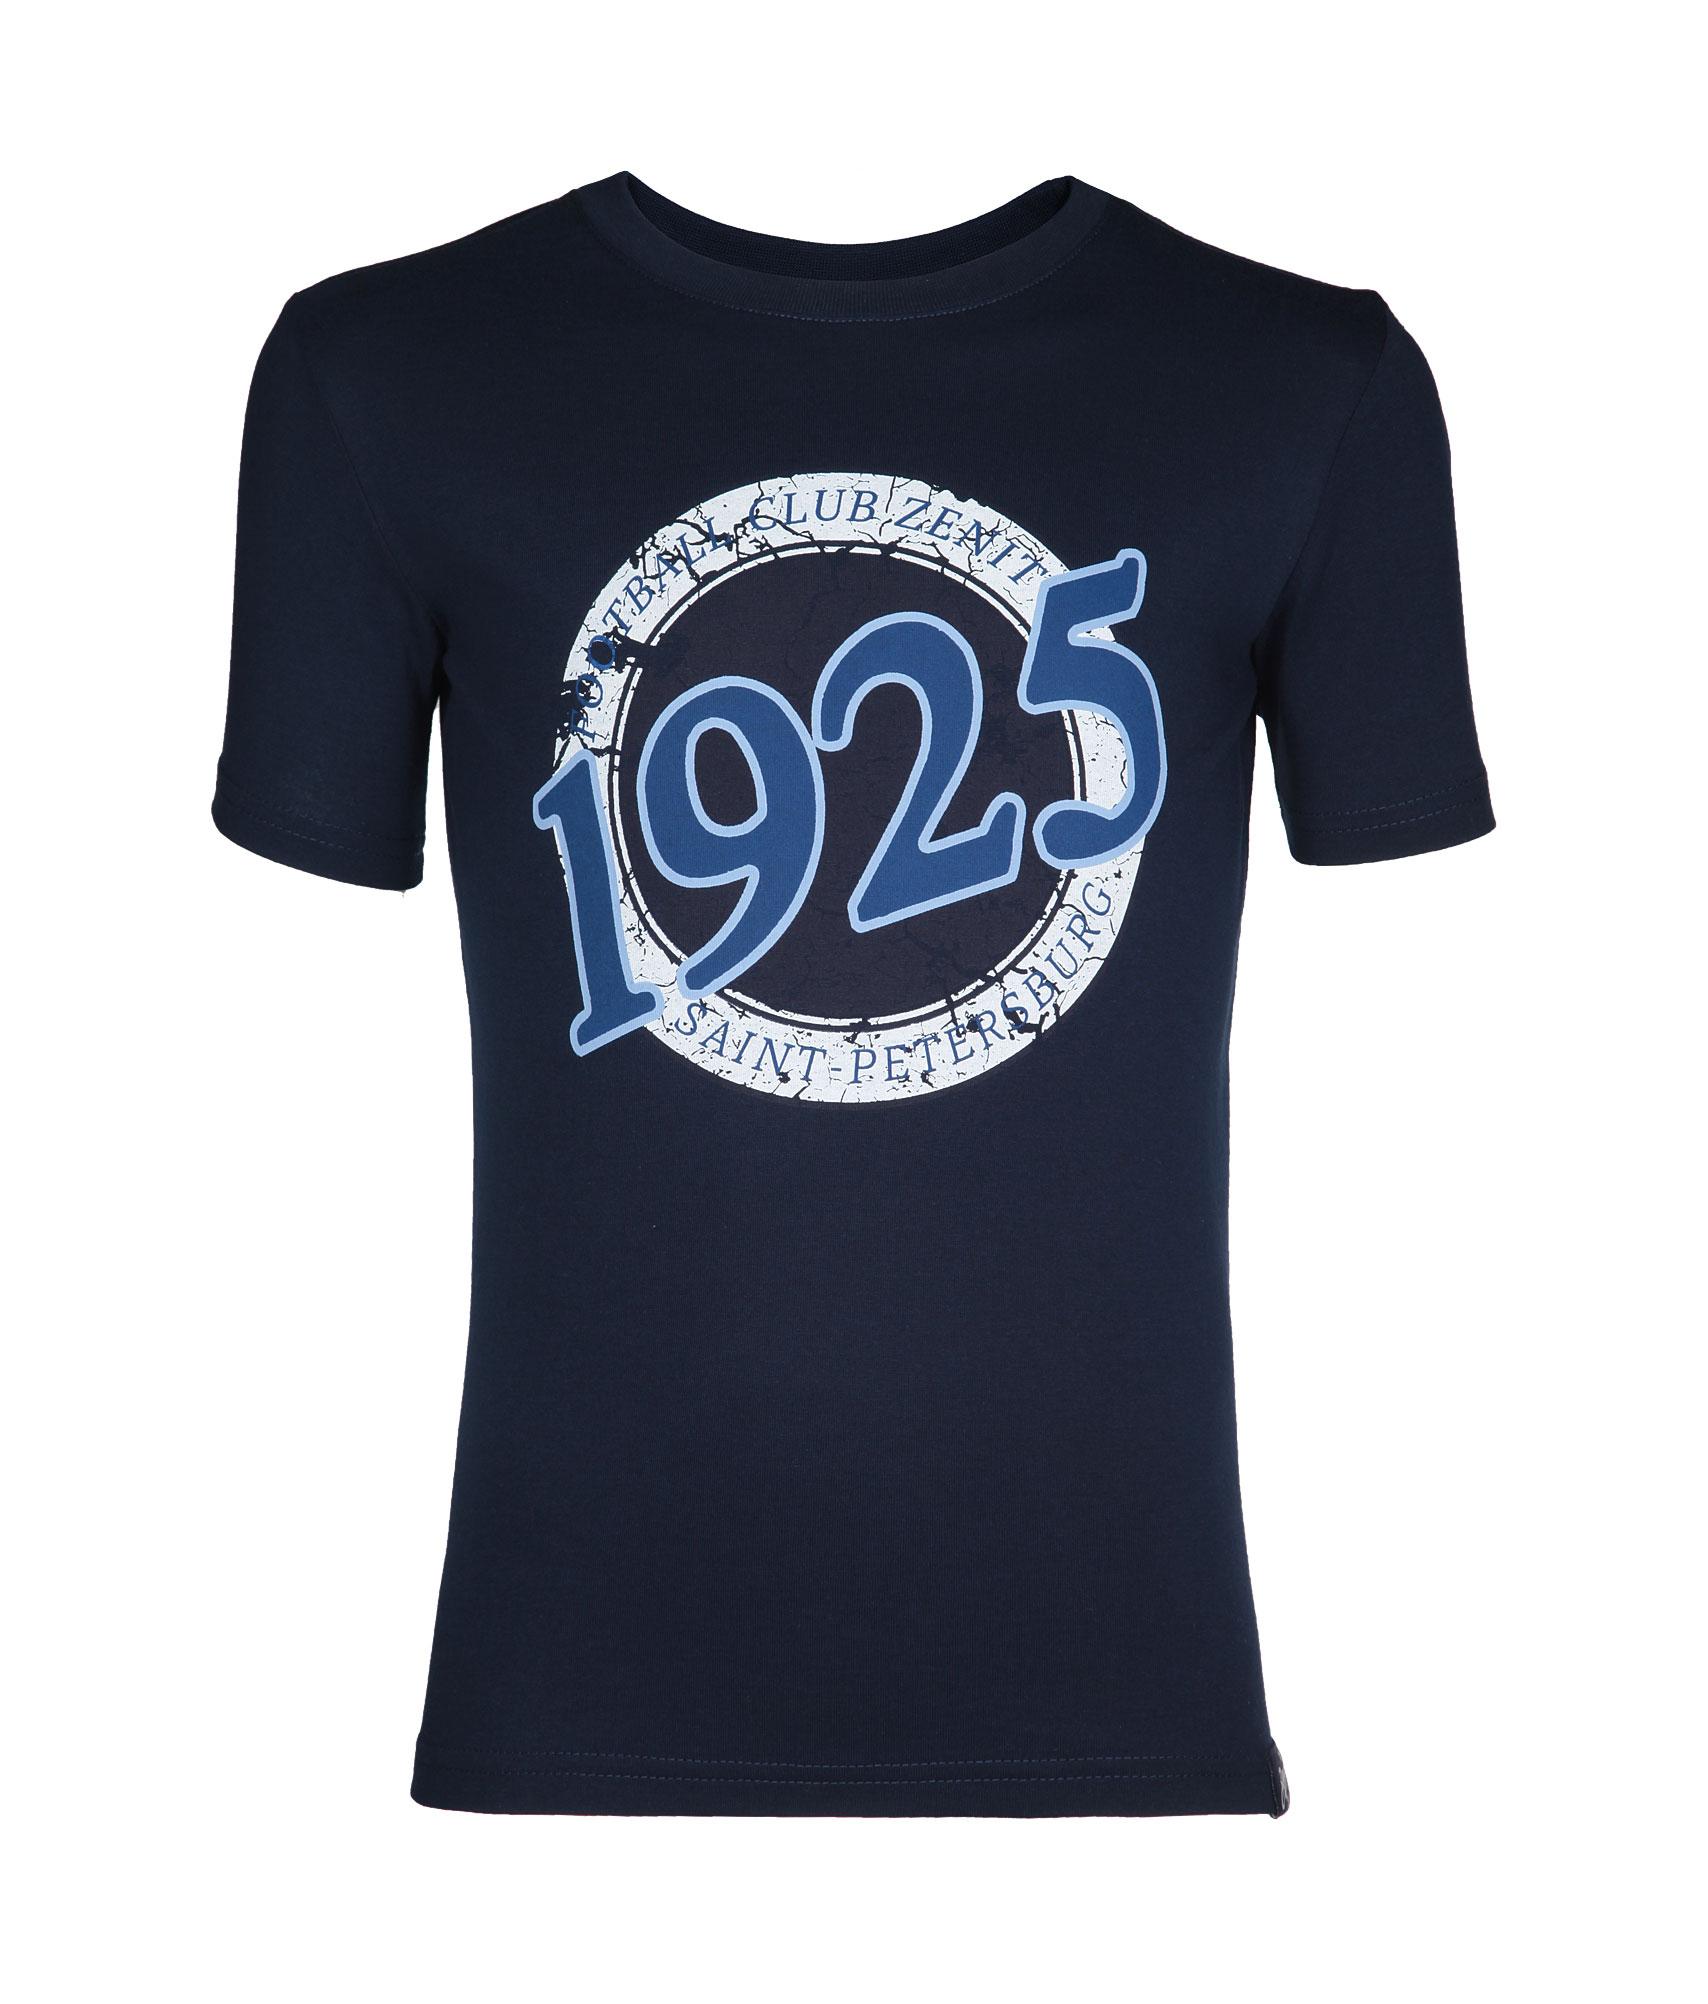 Футболка подростковая, Цвет-Темно-Синий, Размер-140-146 pelican wild space 116 146 р р синяя